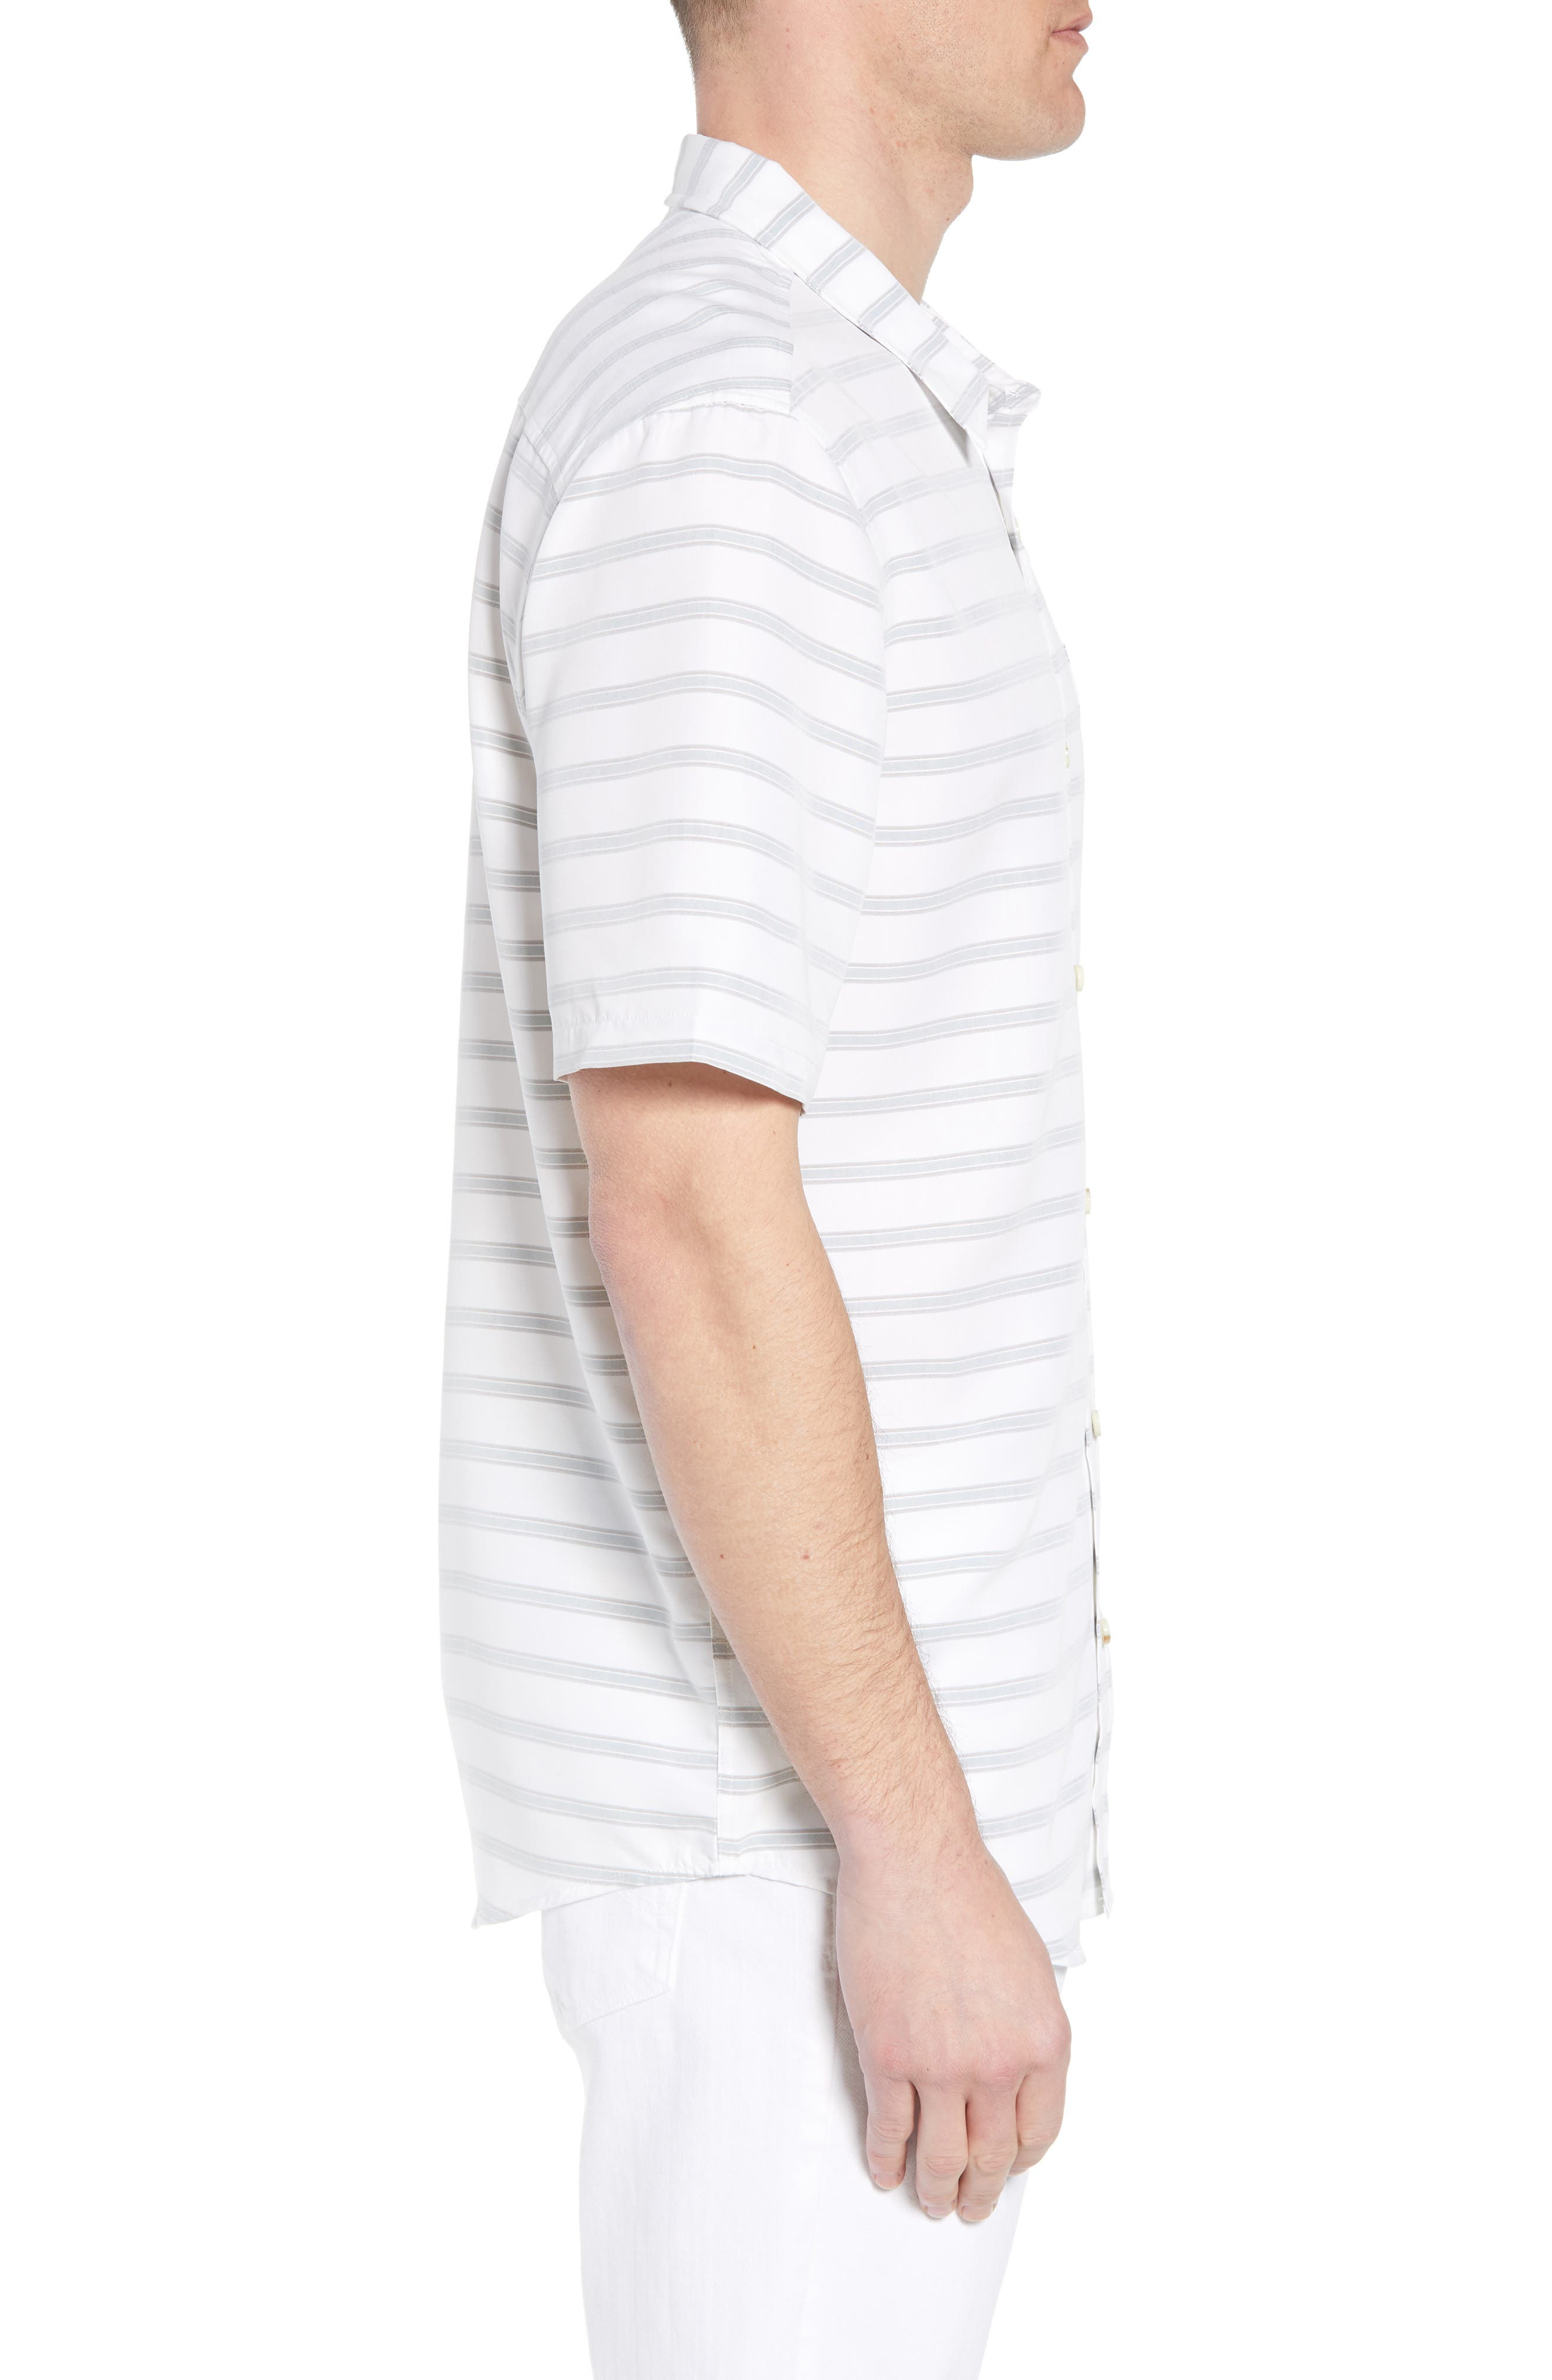 Slow Ride Sport Shirt,                             Alternate thumbnail 4, color,                             White